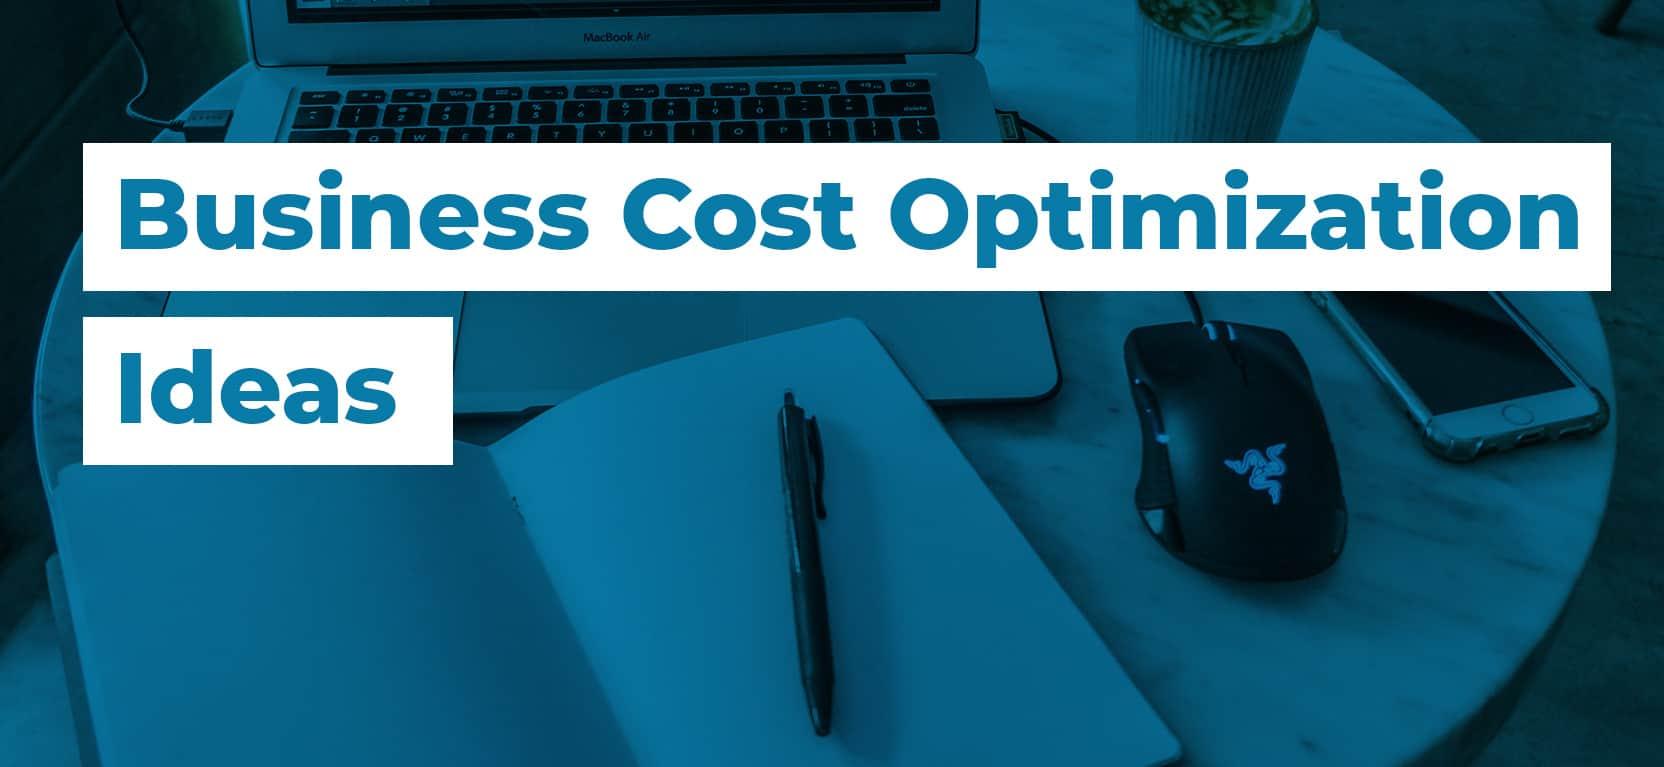 36 Business Cost Optimization Ideas2